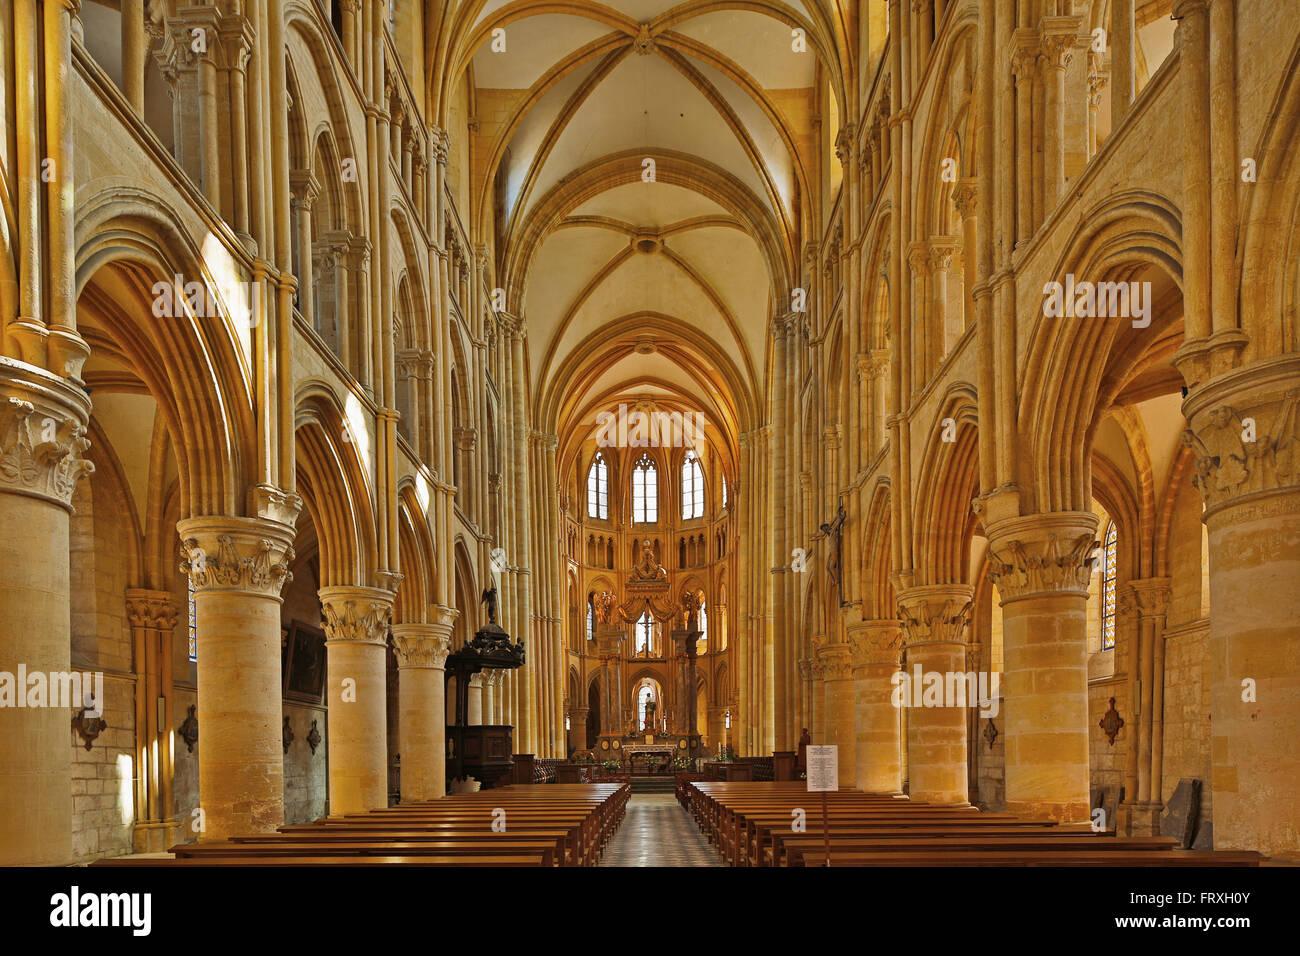 Inside the former monastery church, Mouzon, Gothic style, Vallée de Meuse, Dept. Ardennes, Region Champagne - Stock Image